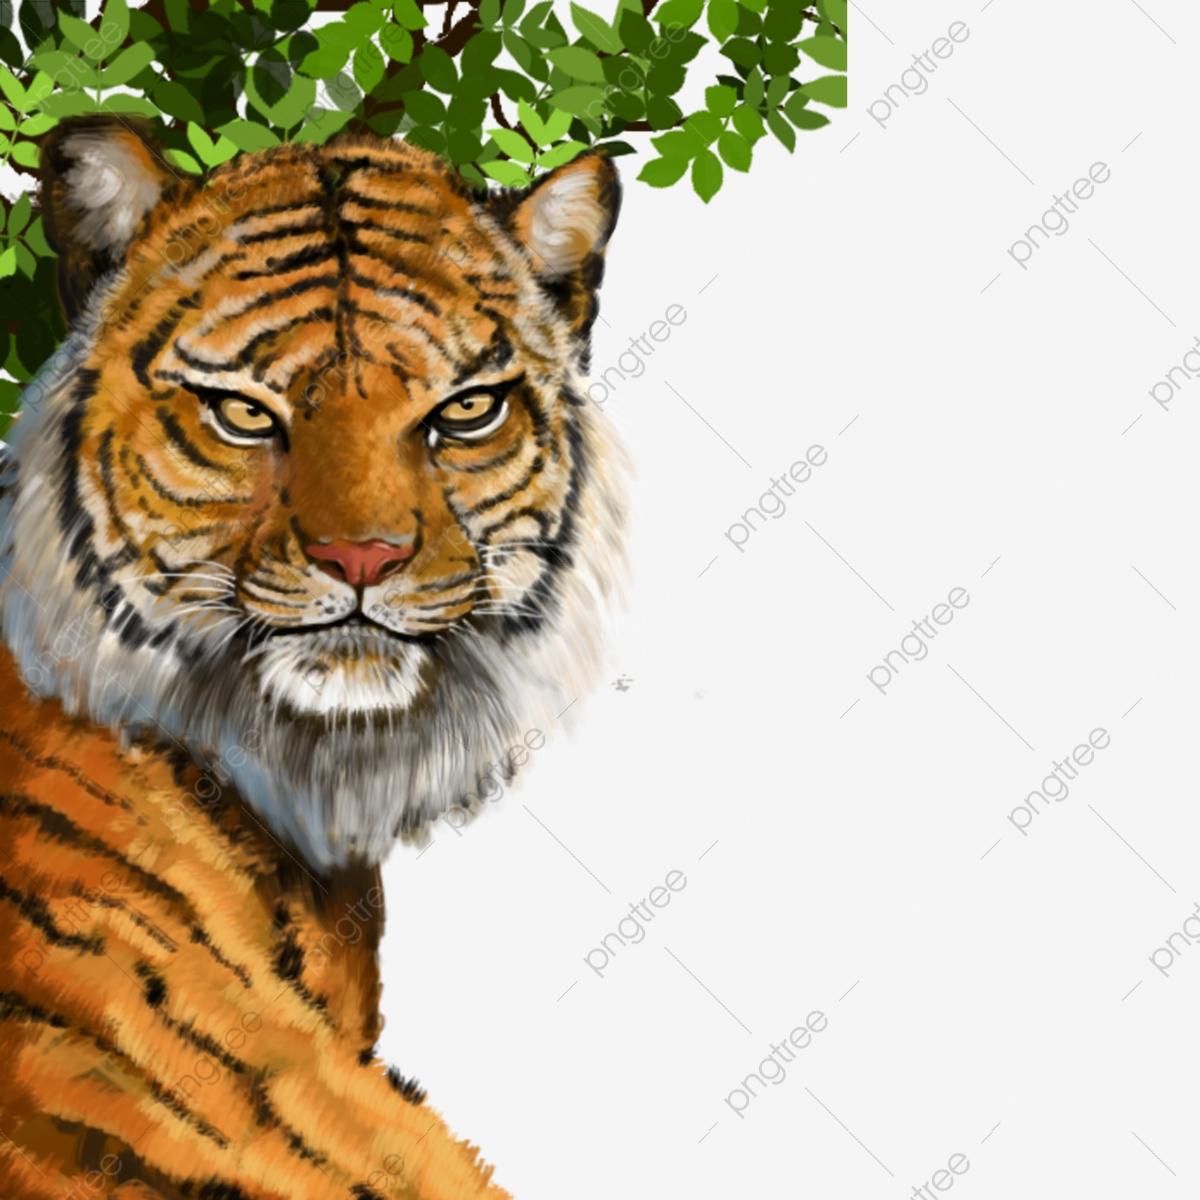 Clipart tiger south china tiger. Hand painted drawn